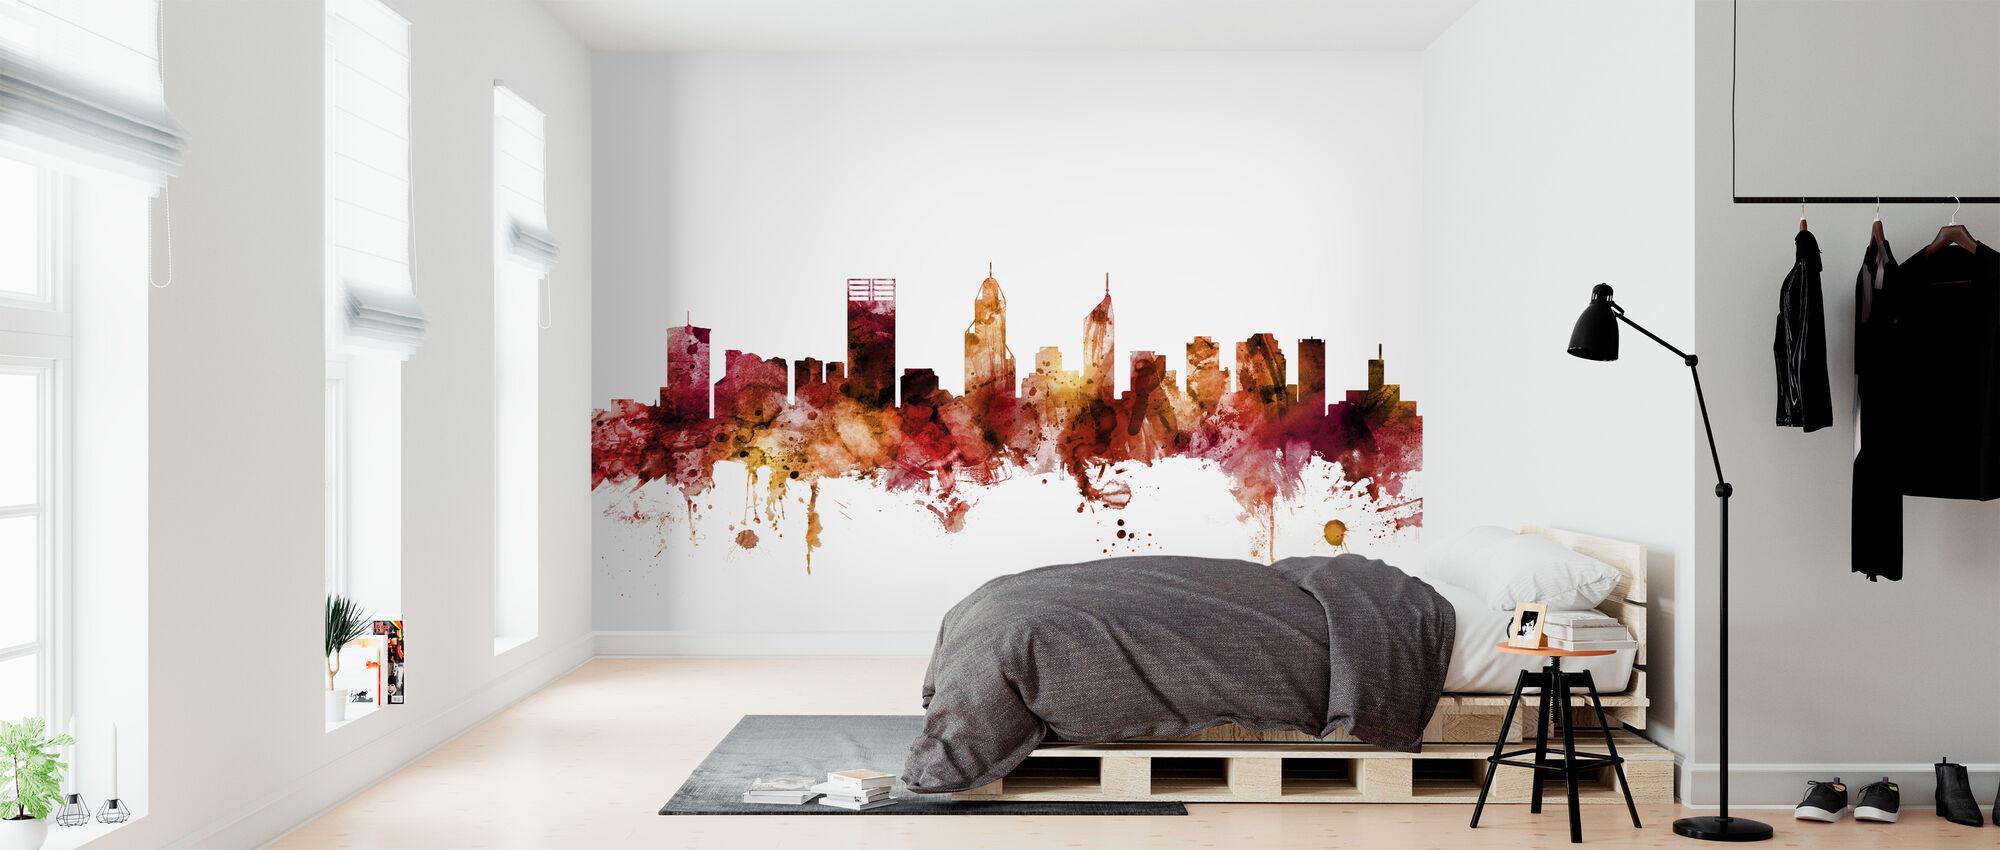 Perth Australia Skyline - Wallpaper - Bedroom